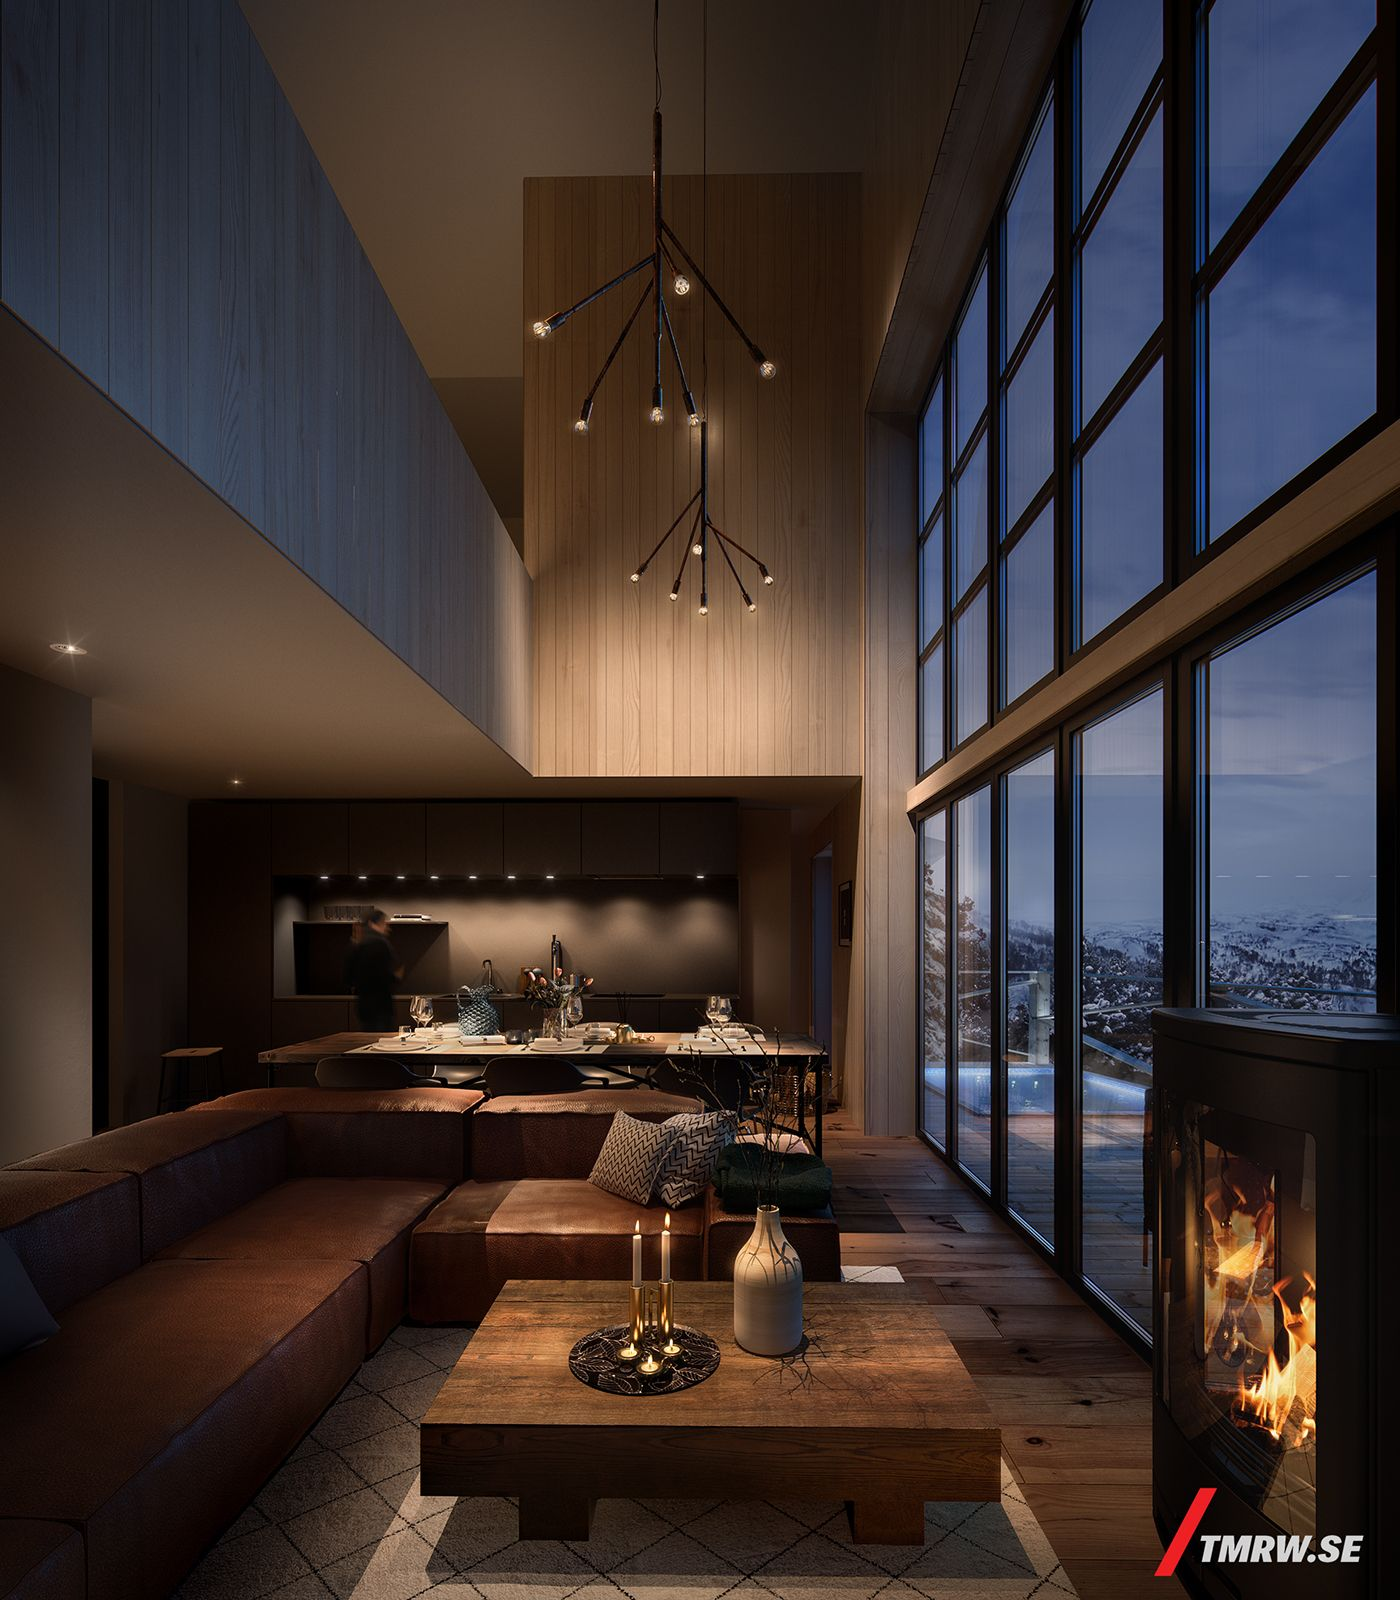 Tomorrow Ab On Behance Interior Design Colleges Modern Interior Design Best Interior Design